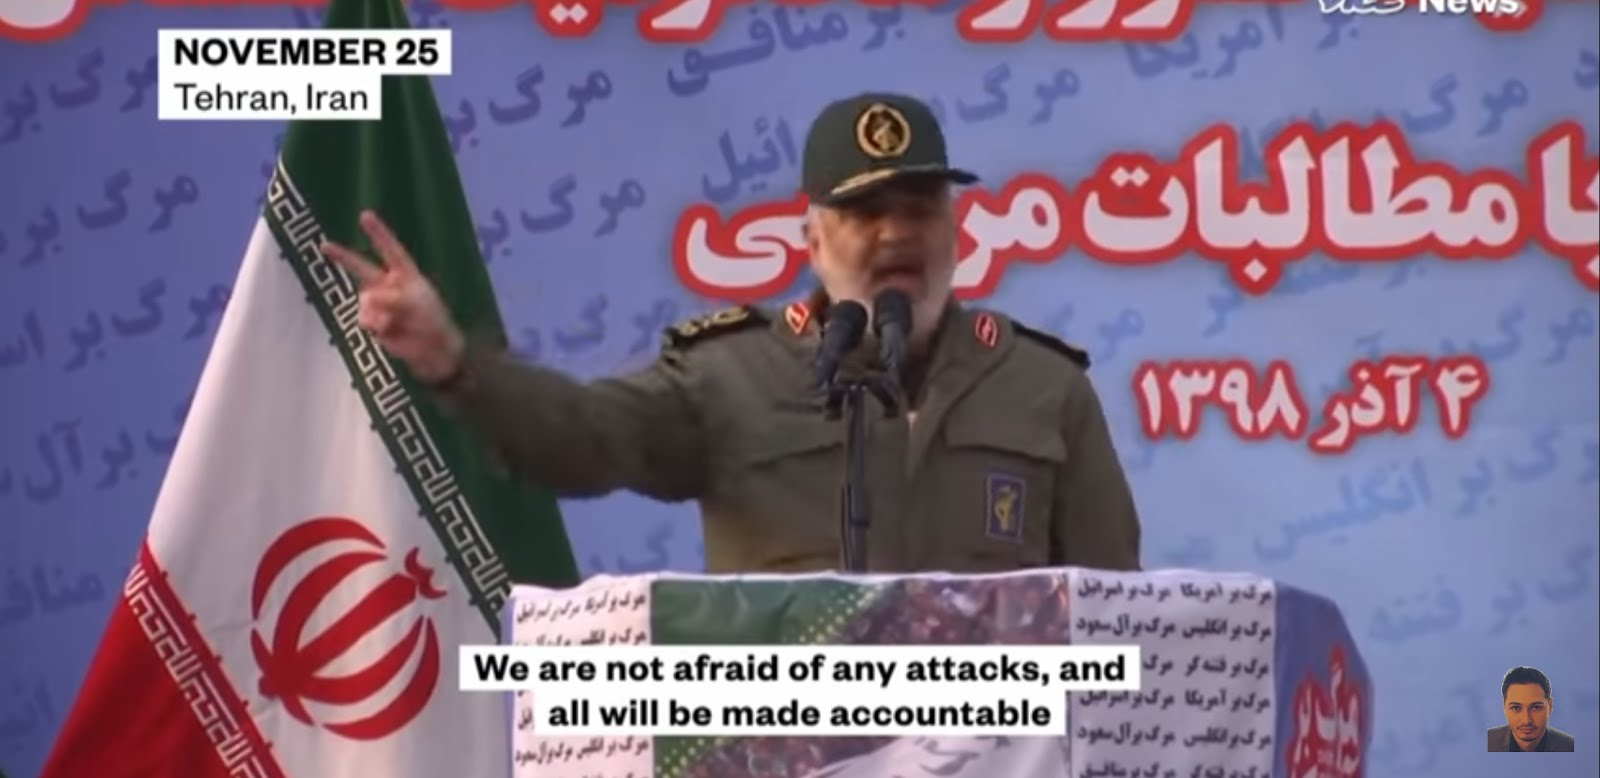 Fighting the Islamo fascists on-line  since 2003